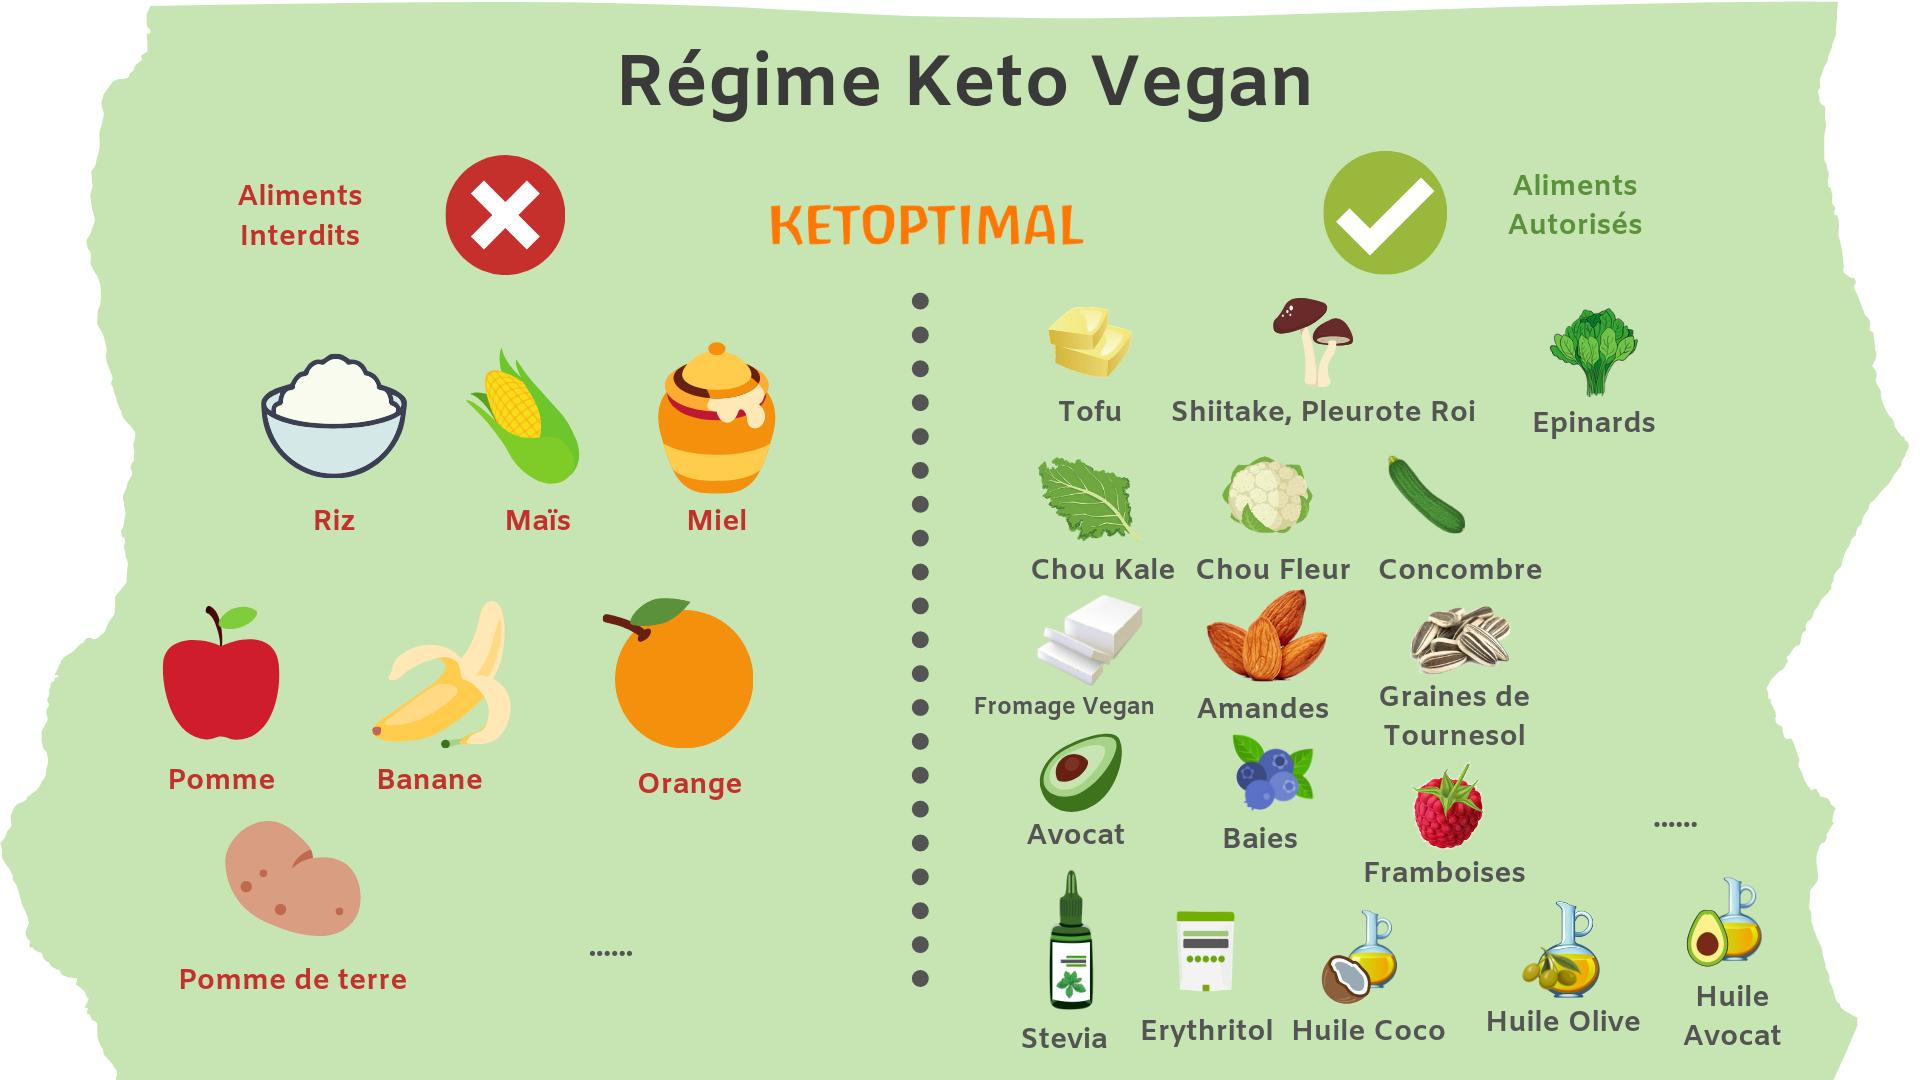 keto diet, régime keto, régime cétogène, diète keto, diète cétogène, alimentation keto, alimentation cétogène, ketoptimal, régime vegan keto, vegan